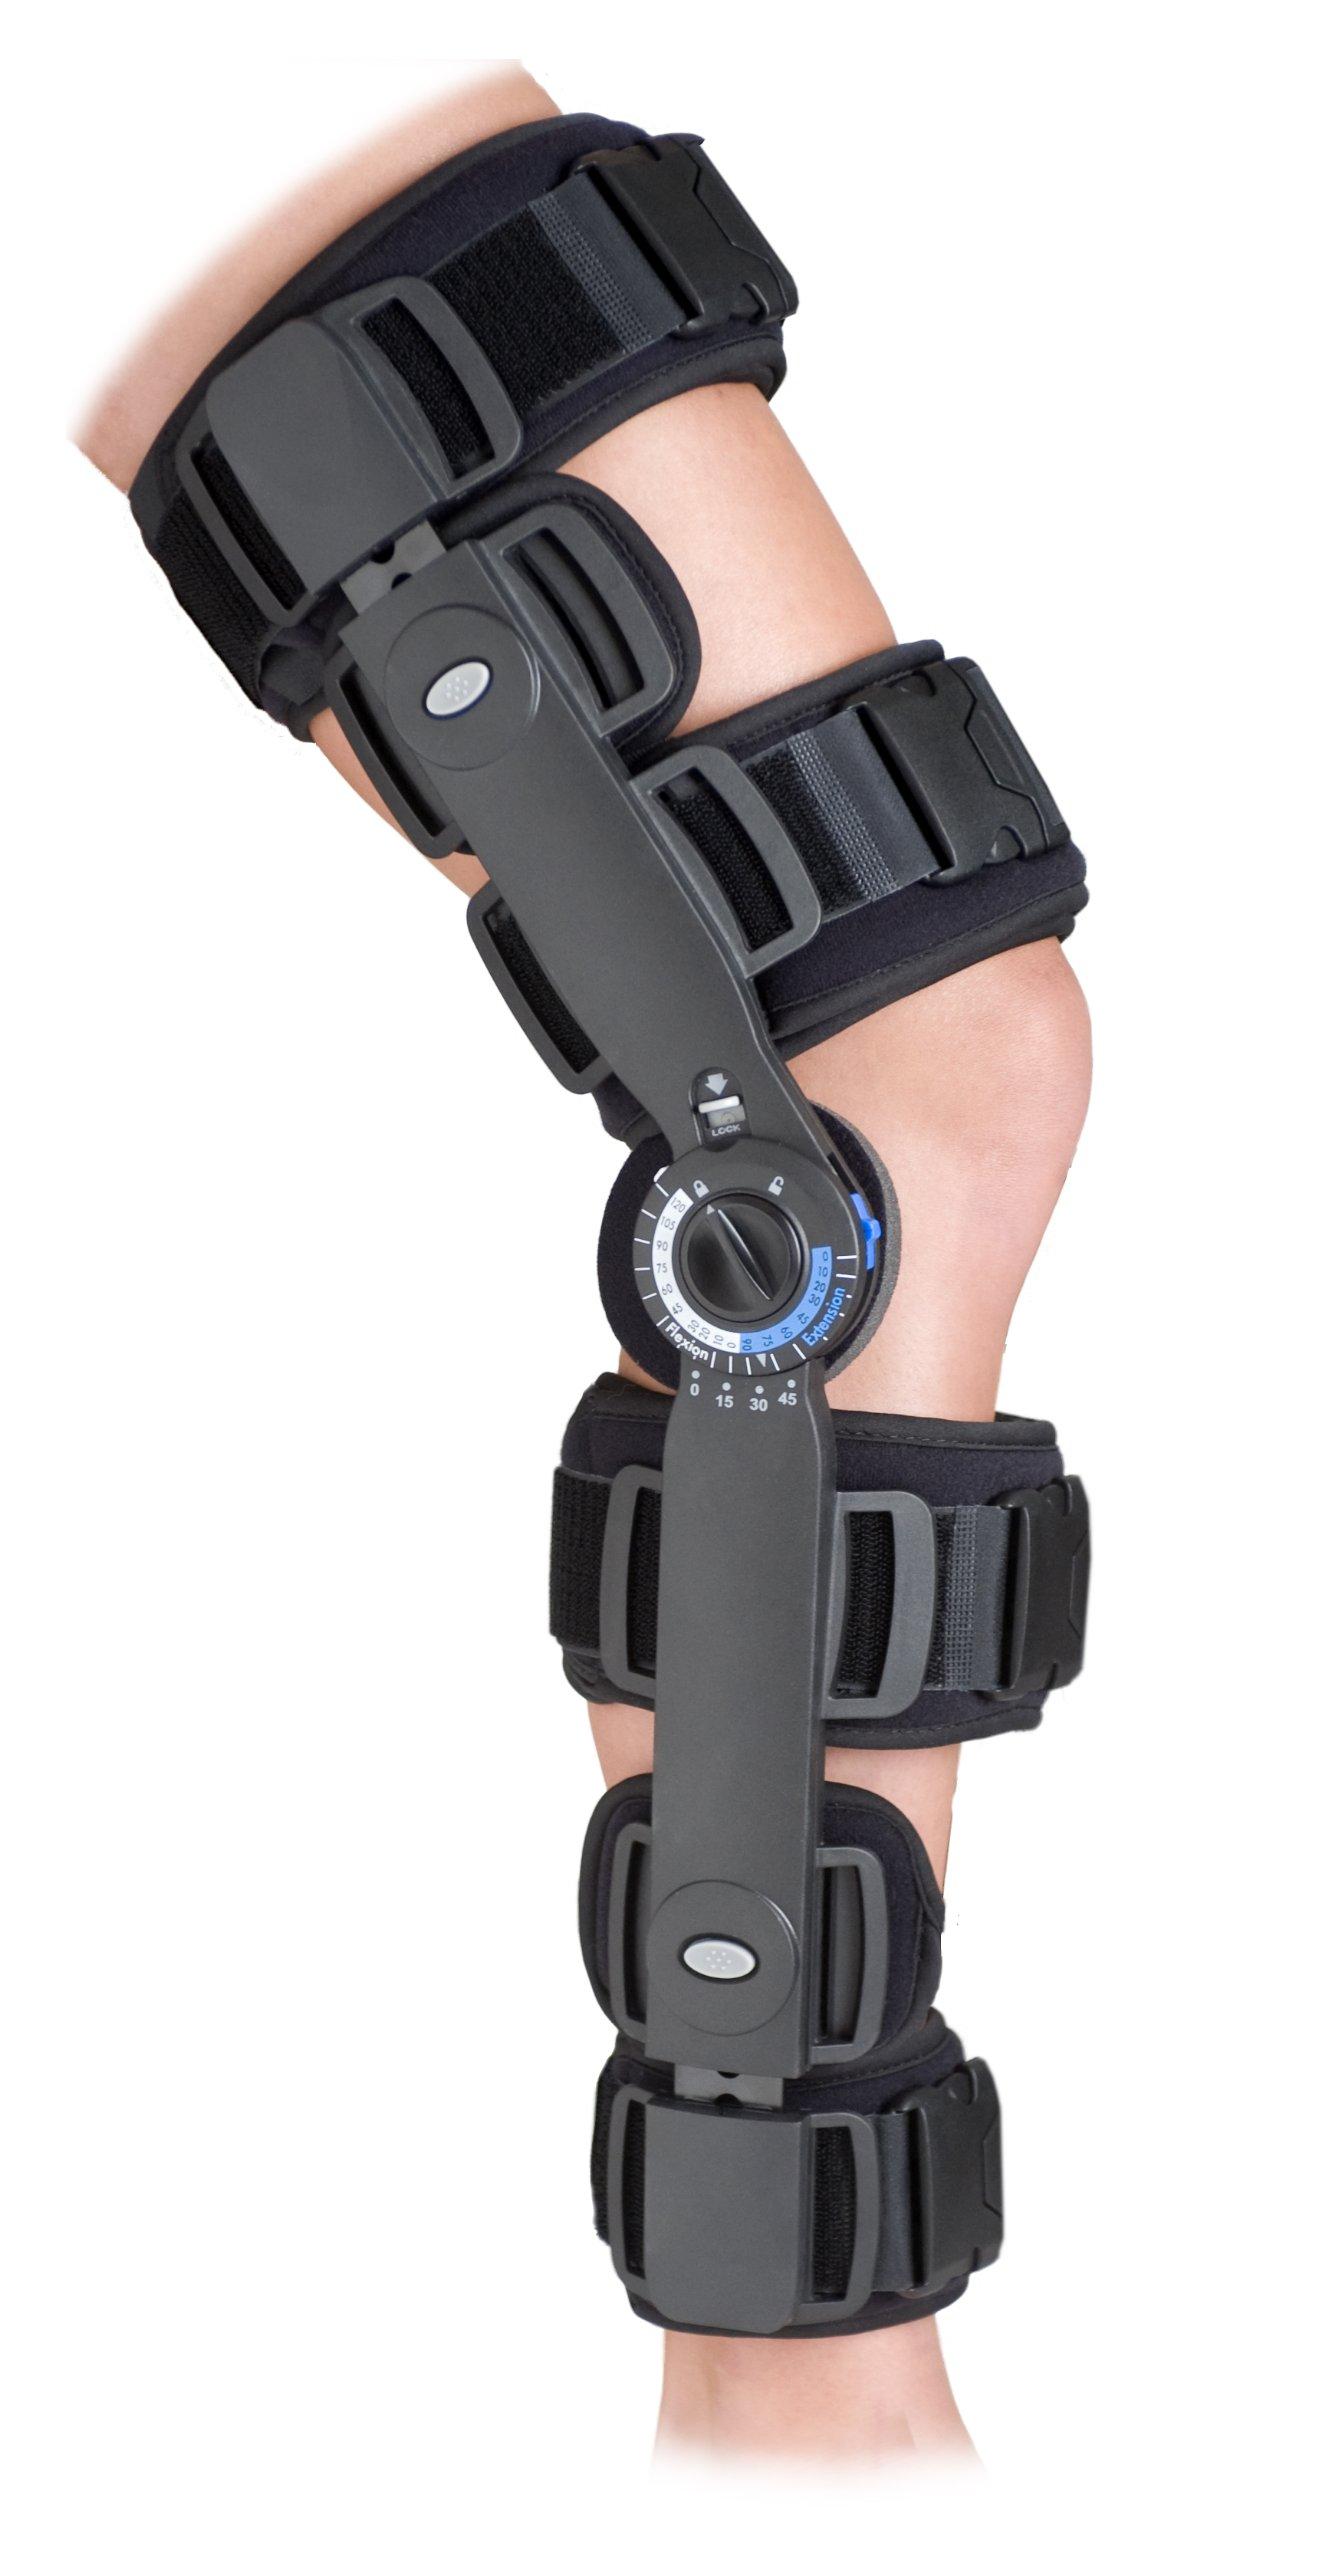 ITA-MED NKN-133 Advanced Rom Post-Op Knee Brace, XL